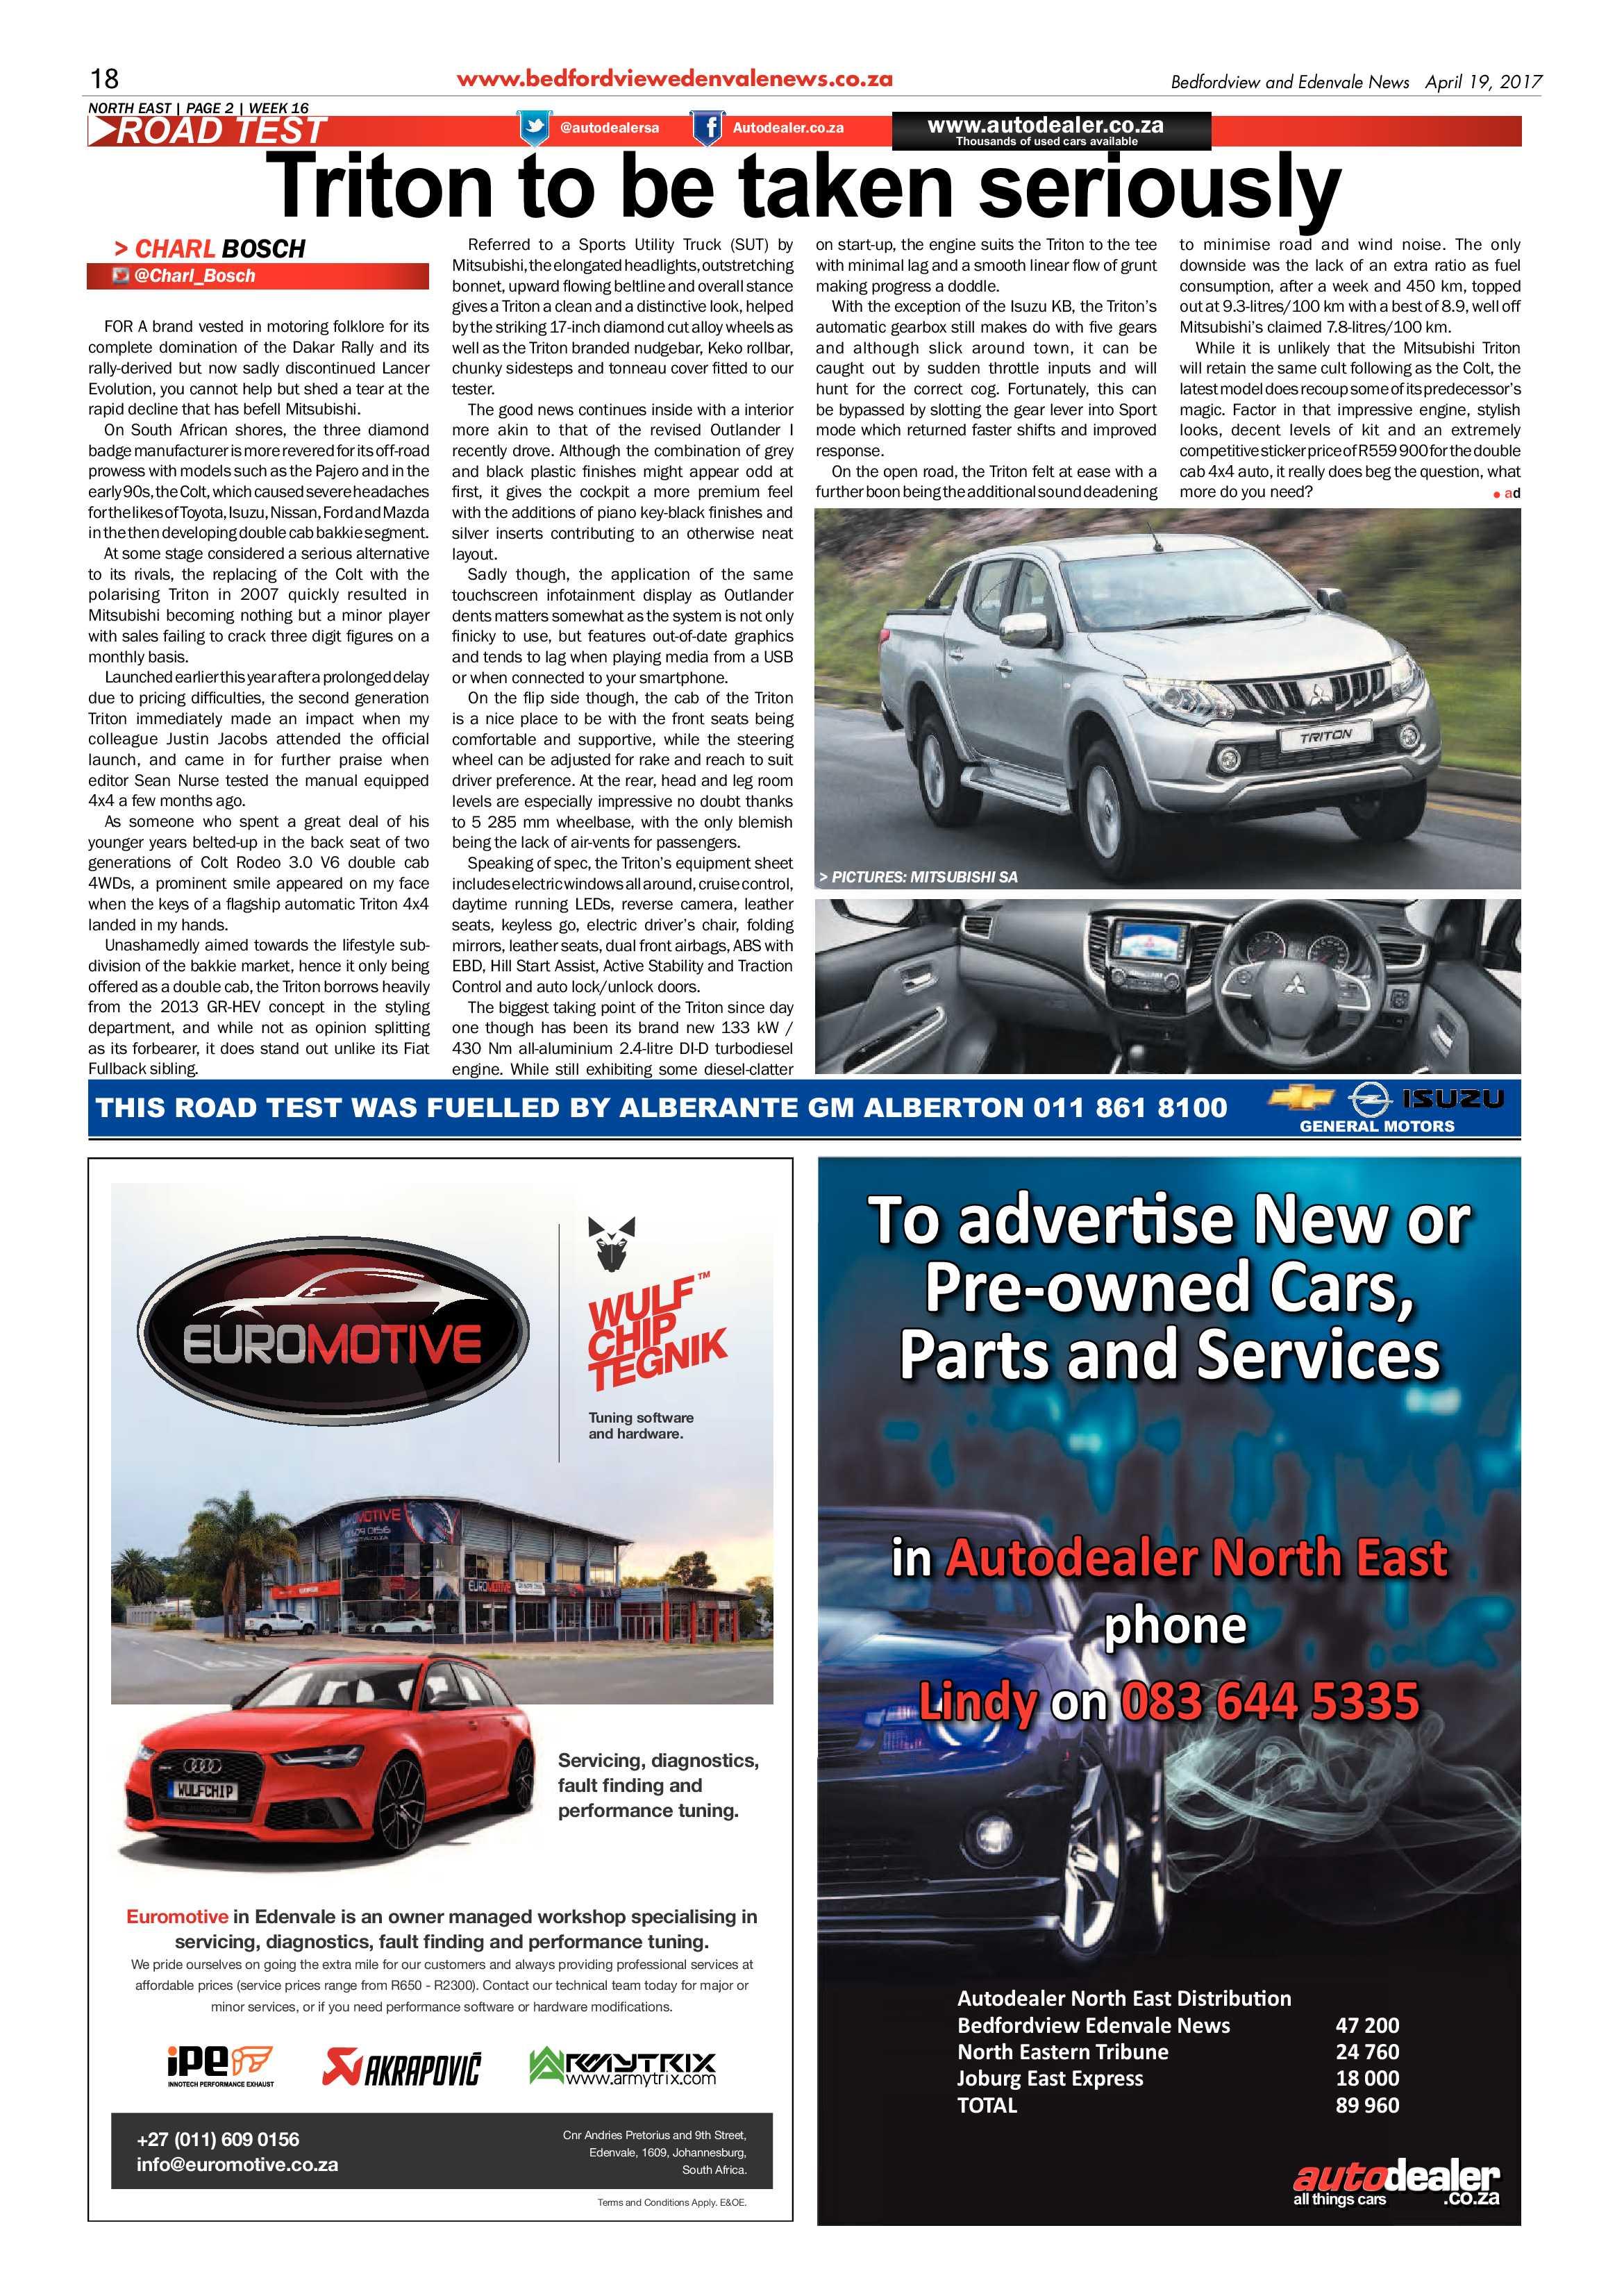 bedfordview-edenvale-news-19-april-2017-epapers-page-18